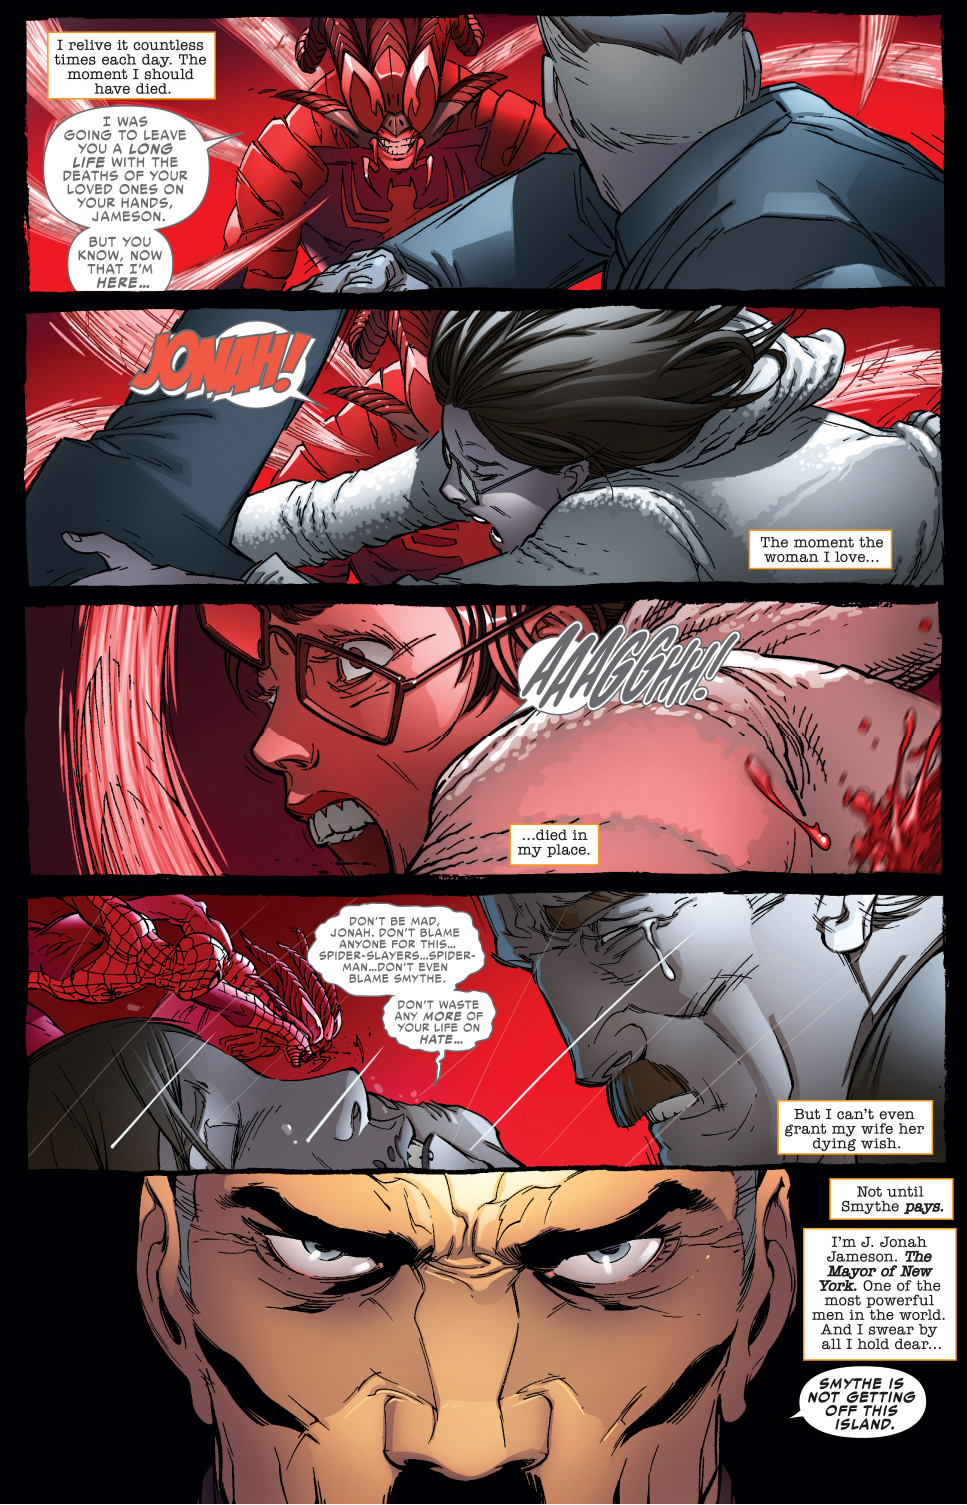 why jonah jameson hates the spider-slayer